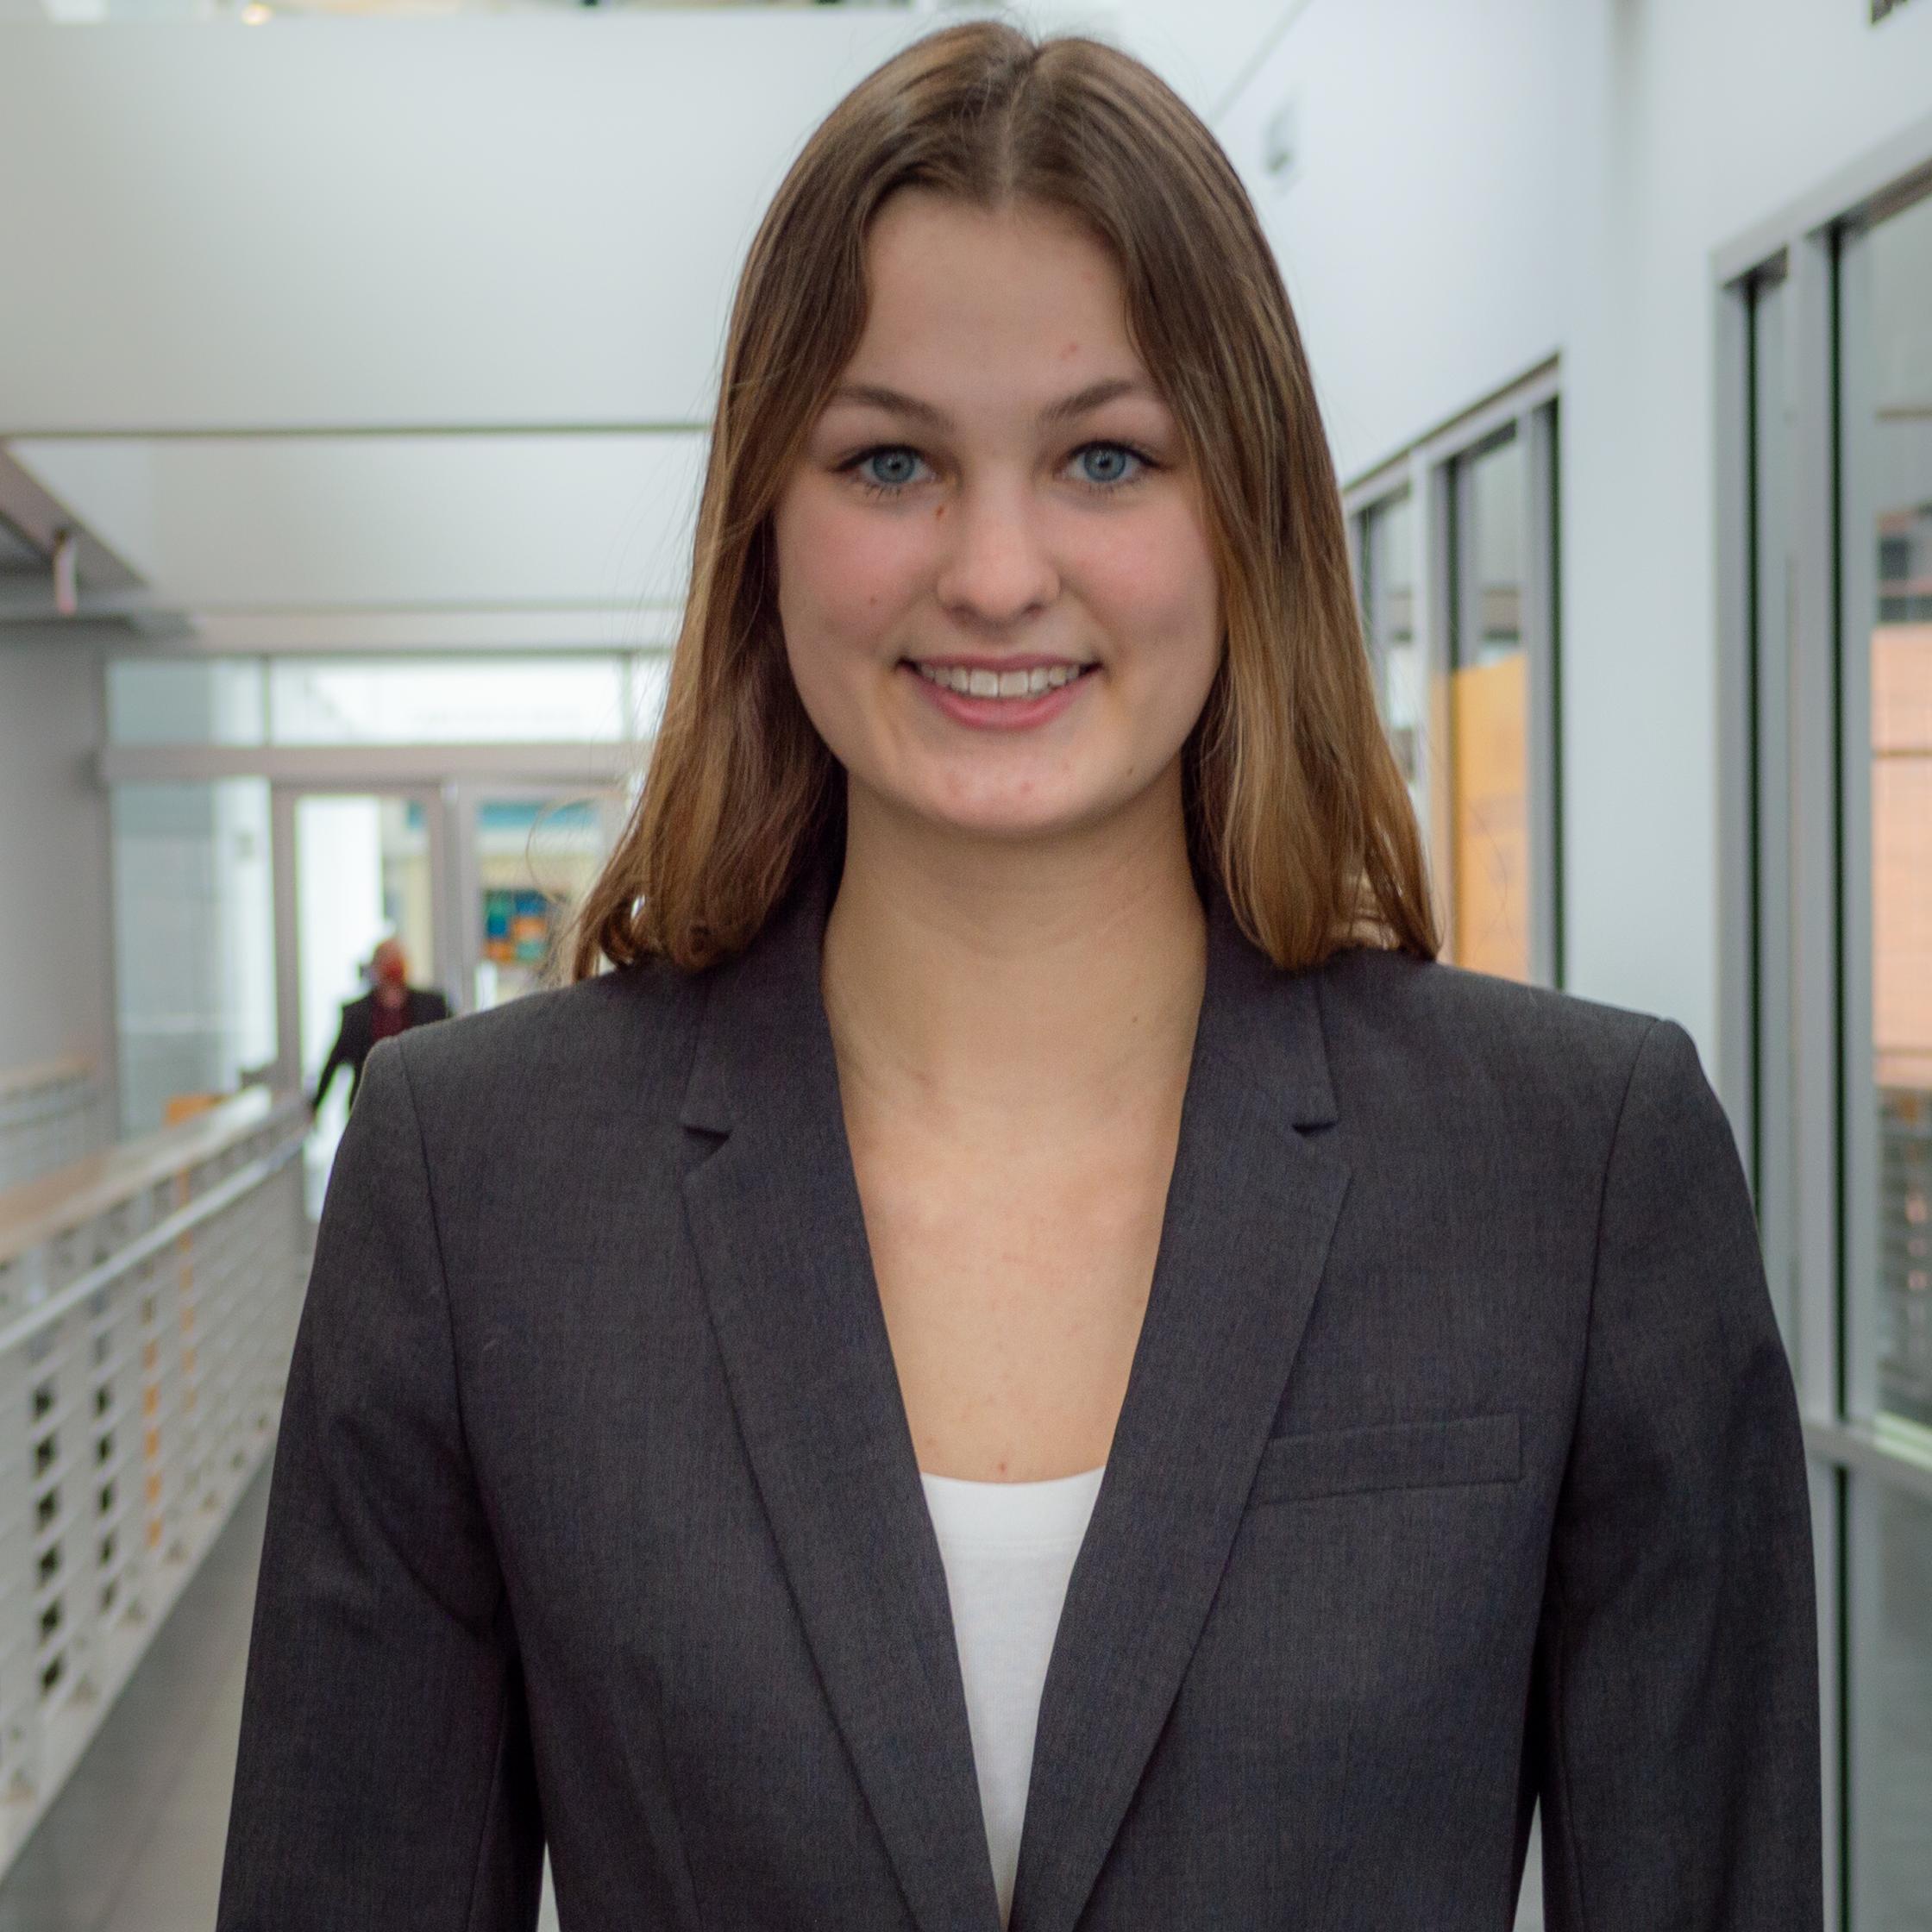 Kiley Giebel from University of Minnesota